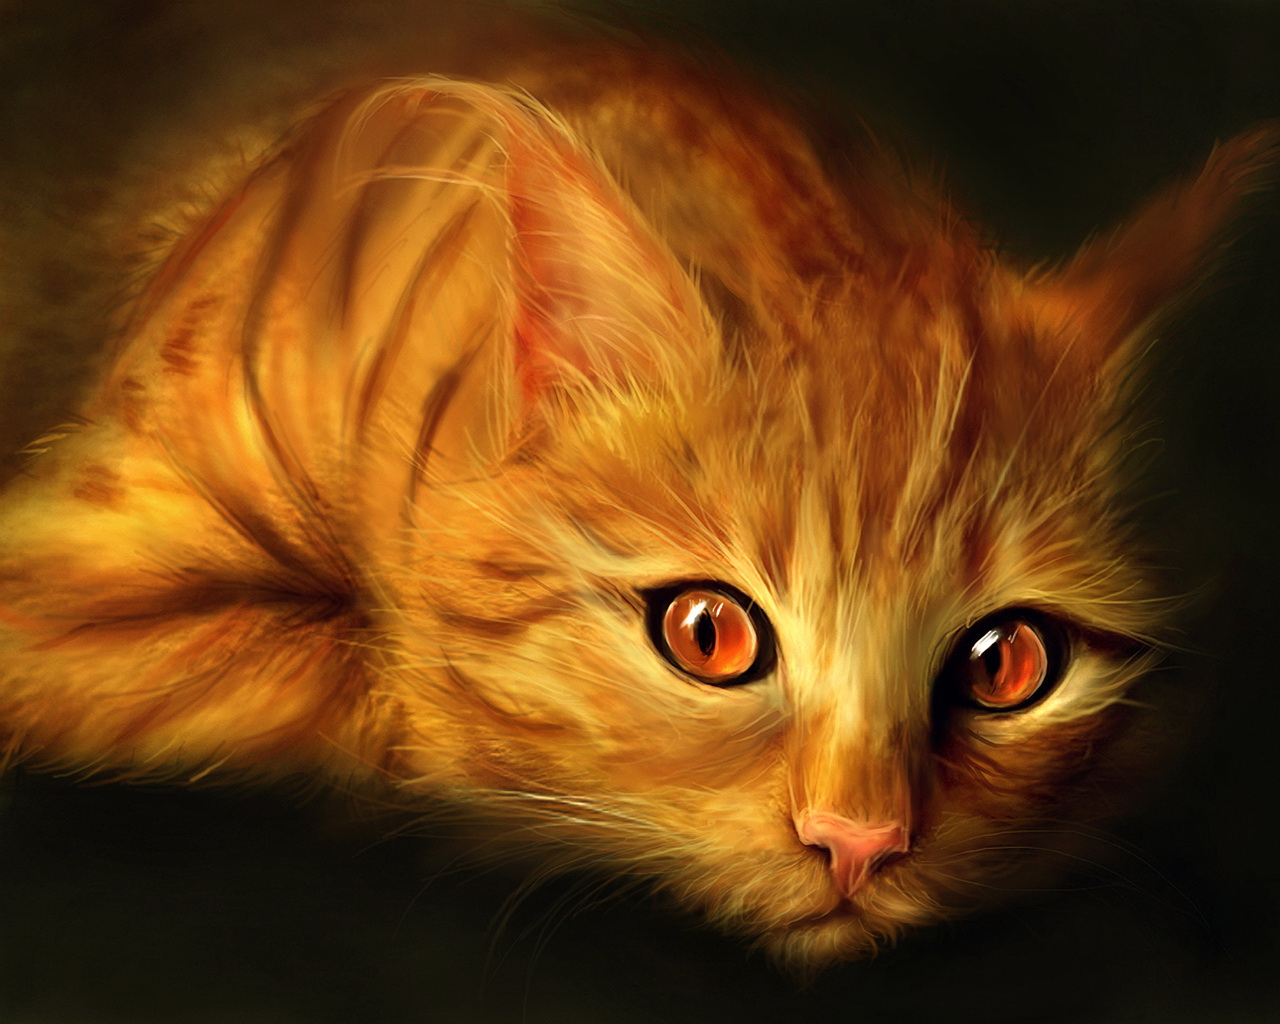 http://2.bp.blogspot.com/_TcklbbvwGGo/S7jmTjwZqgI/AAAAAAAAAAw/GFCb4soBmm8/s1600/red-cat.jpg